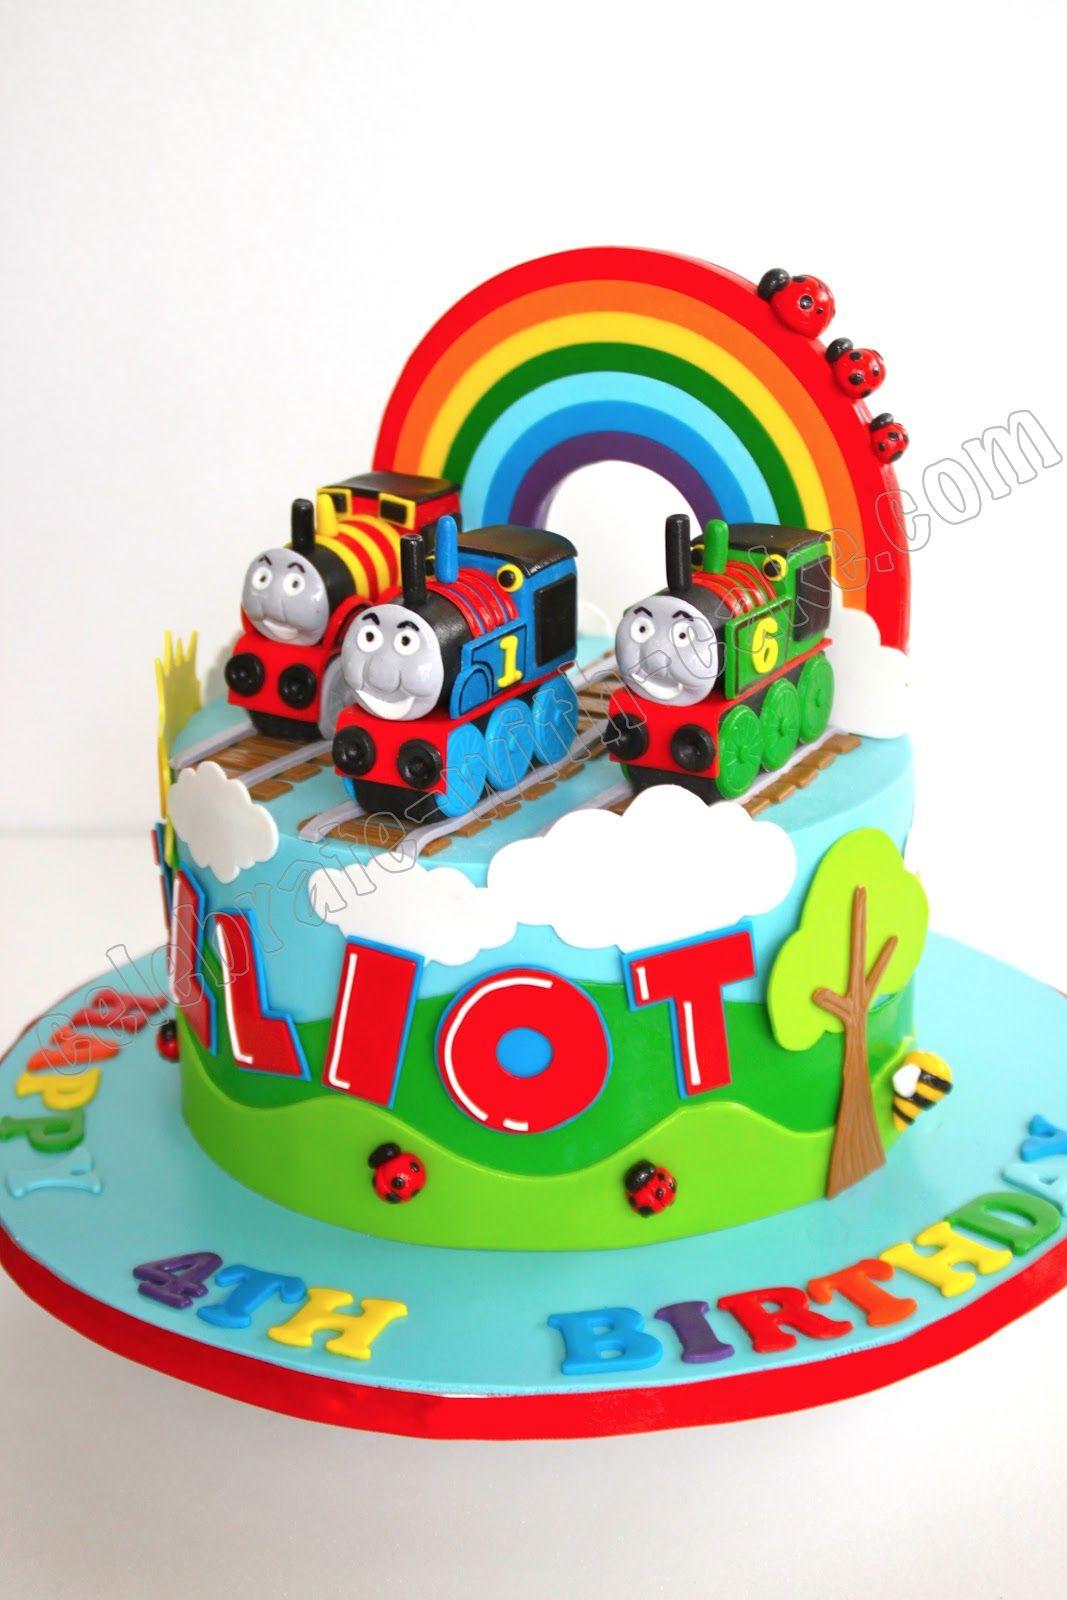 Celebrate With Cake Thomas The Tank Engine